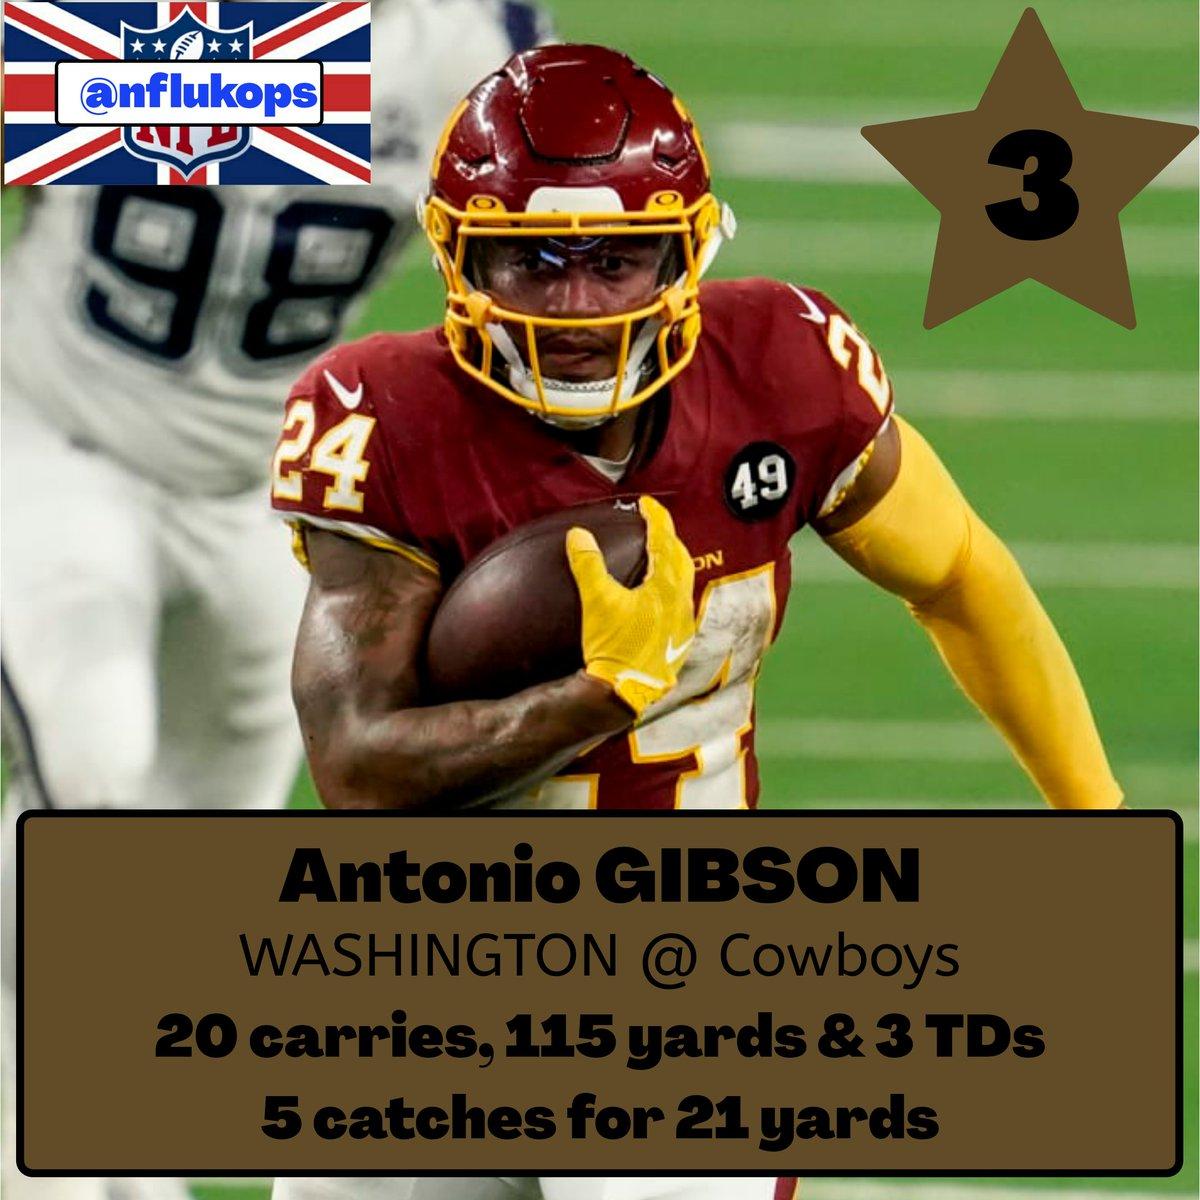 TOP 10 #NFL WEEK 12 OFFENSIVE PERFORMERS COUNTDOWN*...  NO. 3 is... 👇  *Team must win to be in! #NFLUKOPS #TOUCHDOWN #NFLTWITTER #NFLOFFENSIVEPERFORMERS #NFLWEEK12 #WashingtonFootball #WASvsDAL @WashingtonNFL @AntonioGibson14 @WashingtonFTUK @WashingtonFanUK @washingtonfcuk1